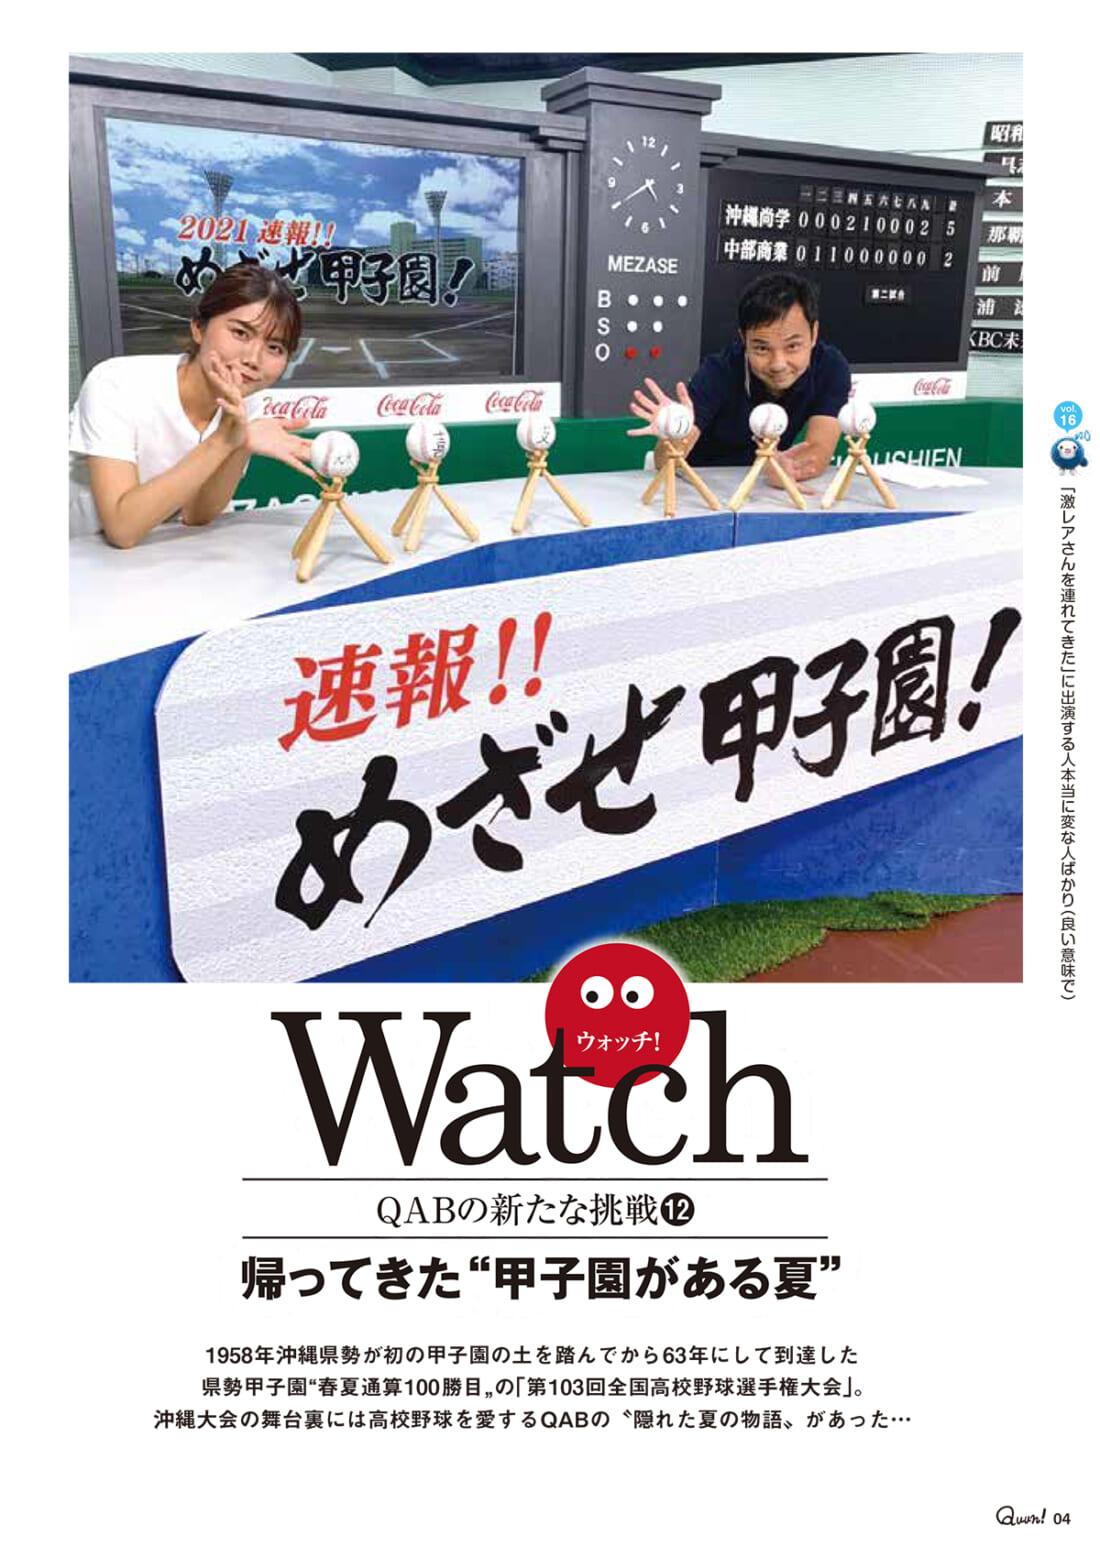 https://www.qab.co.jp/qgoro/wp-content/uploads/quun_1606-1100x1558.jpg